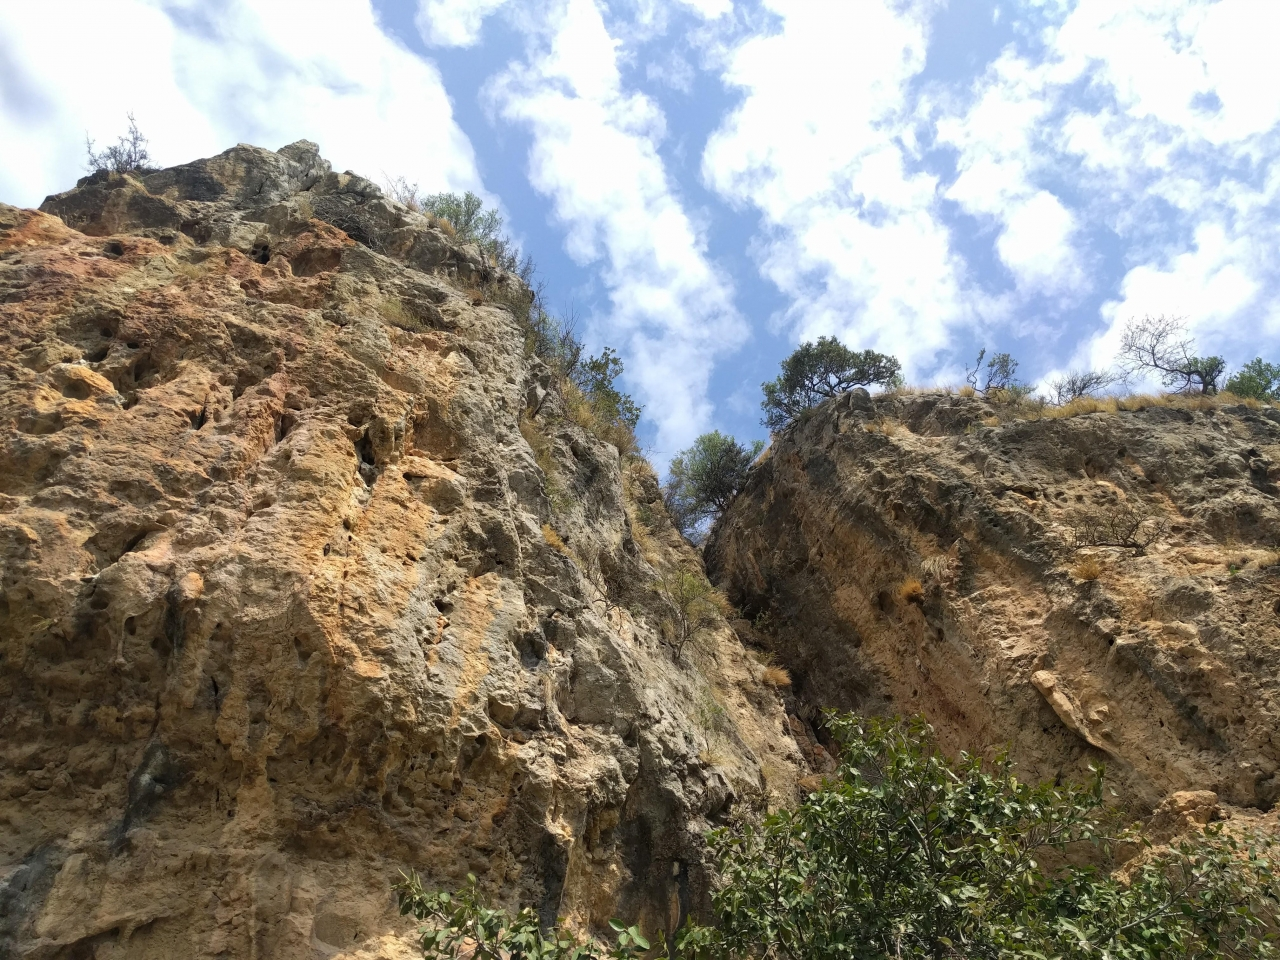 A picture from Mastodon Wall. by Shehryar Khattak